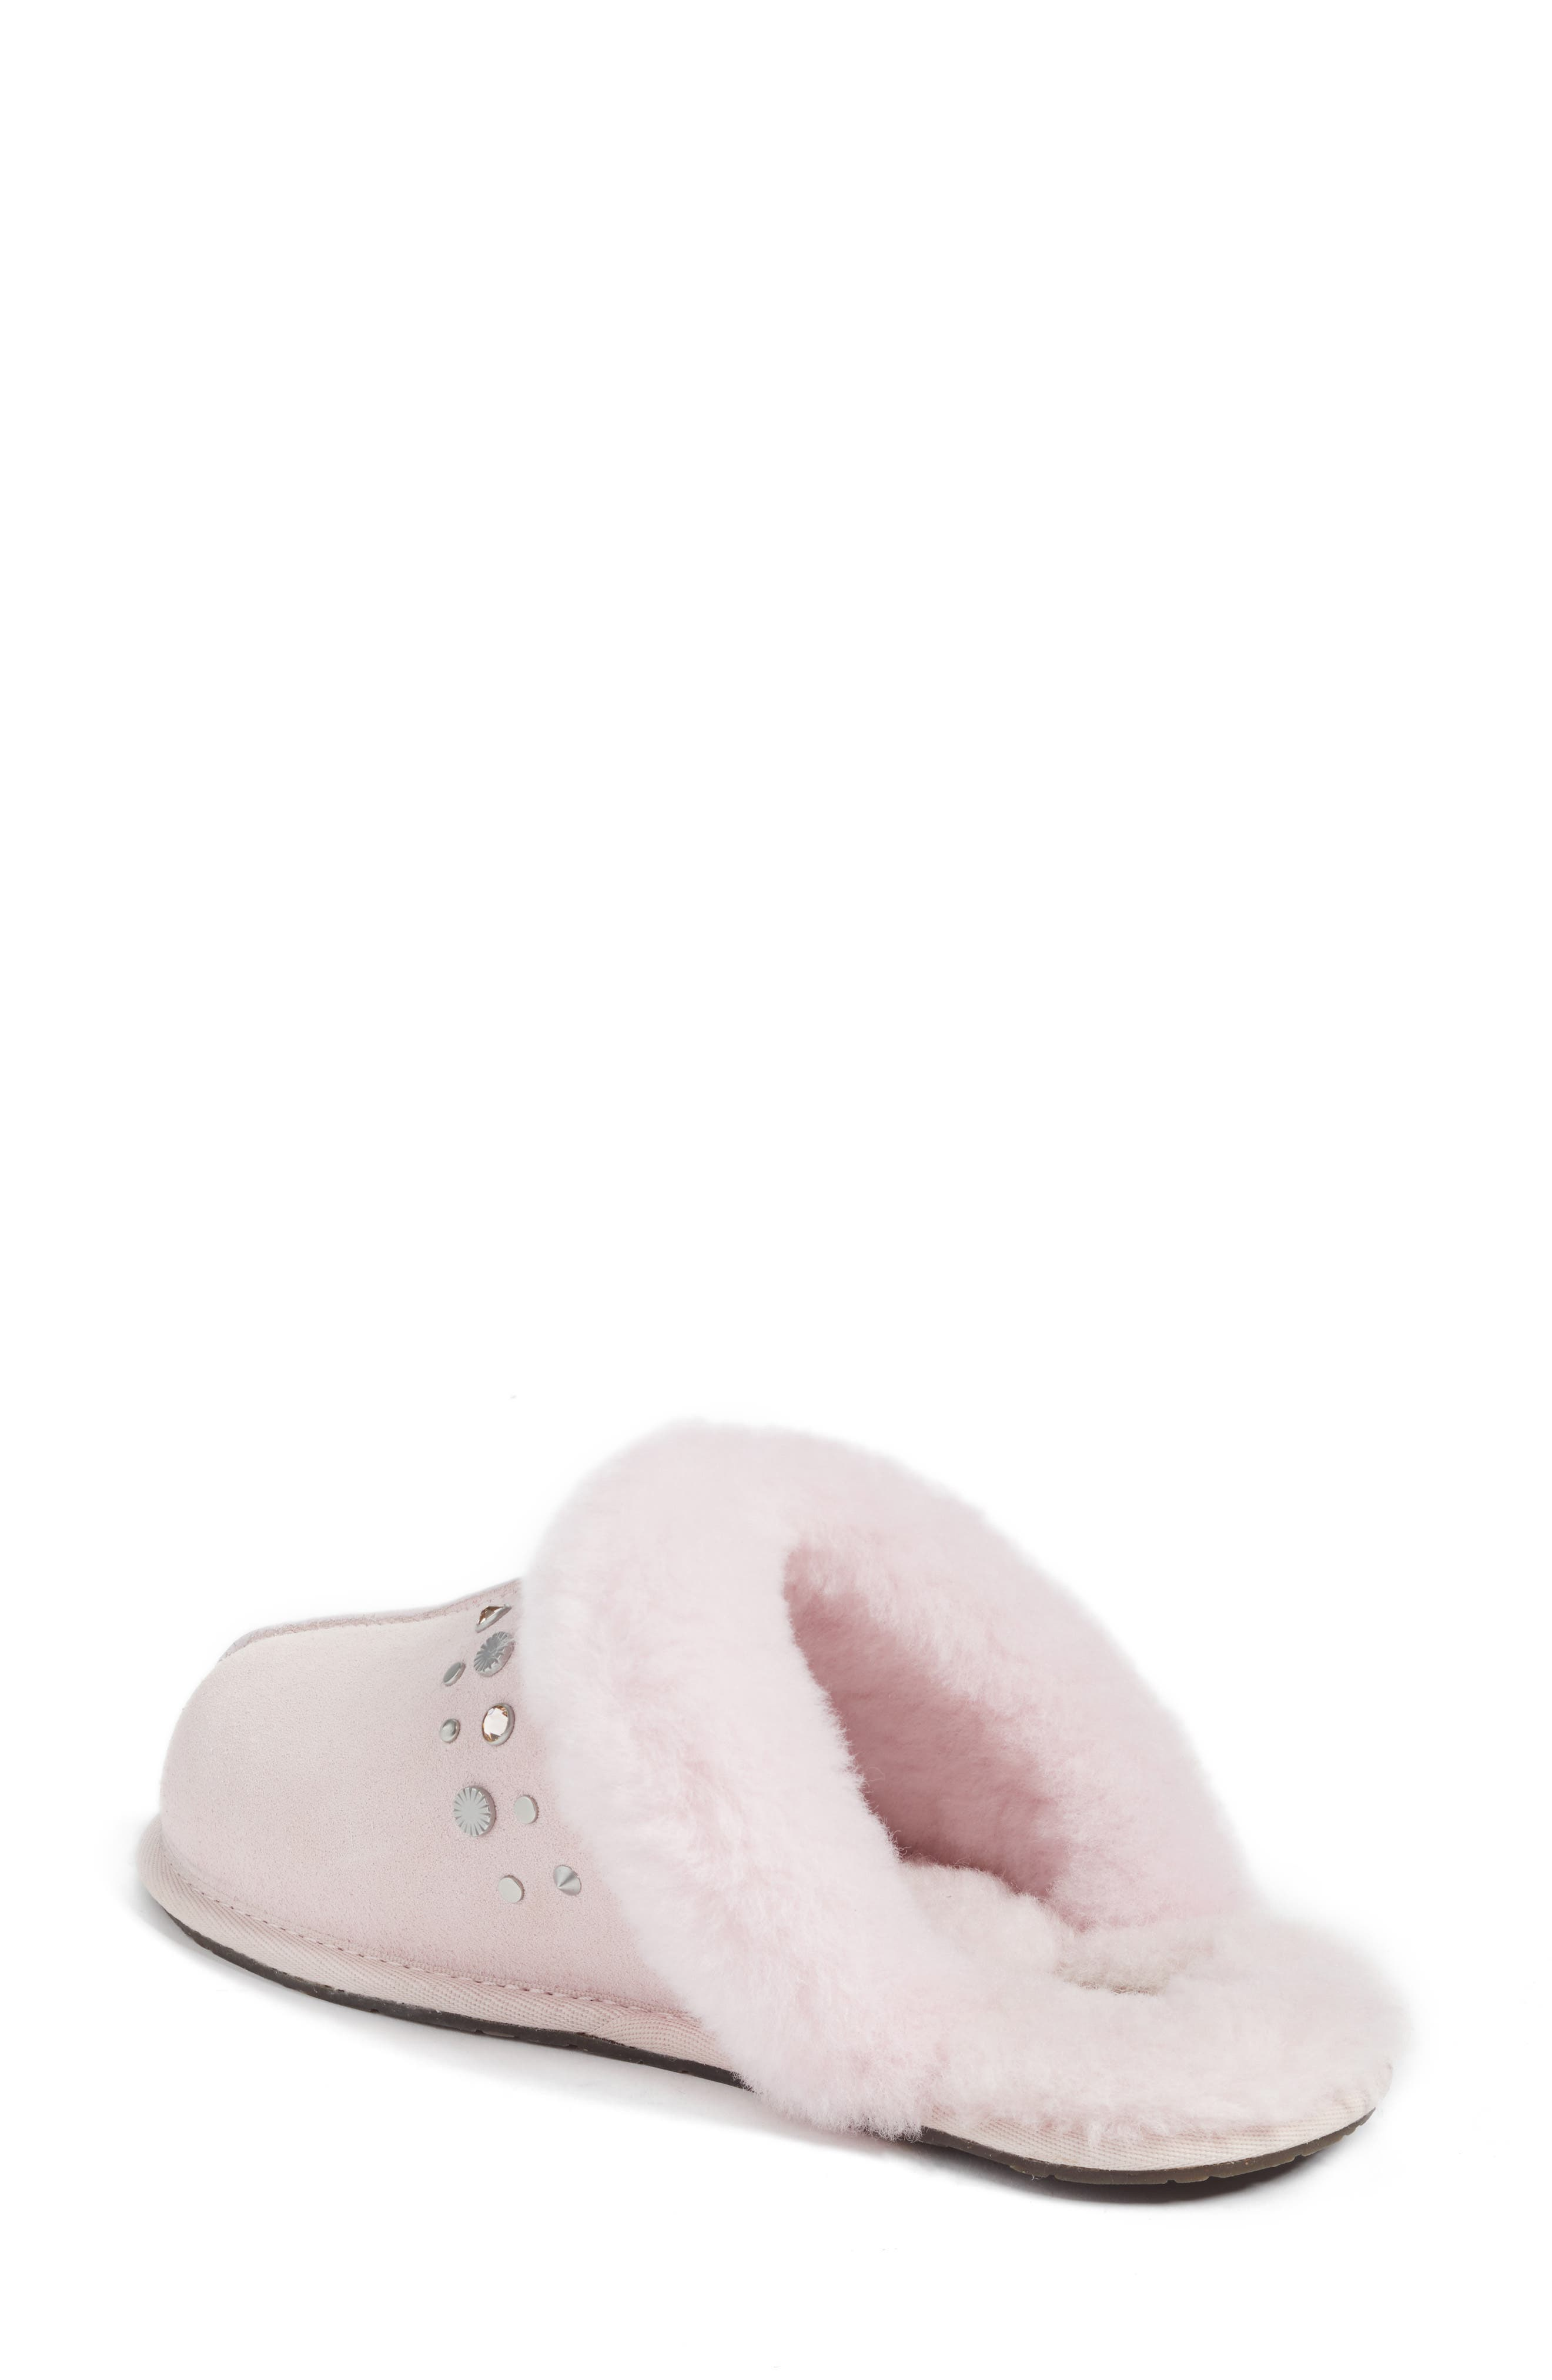 Scuffette II Studded Slipper,                             Alternate thumbnail 3, color,                             Seashell Pink